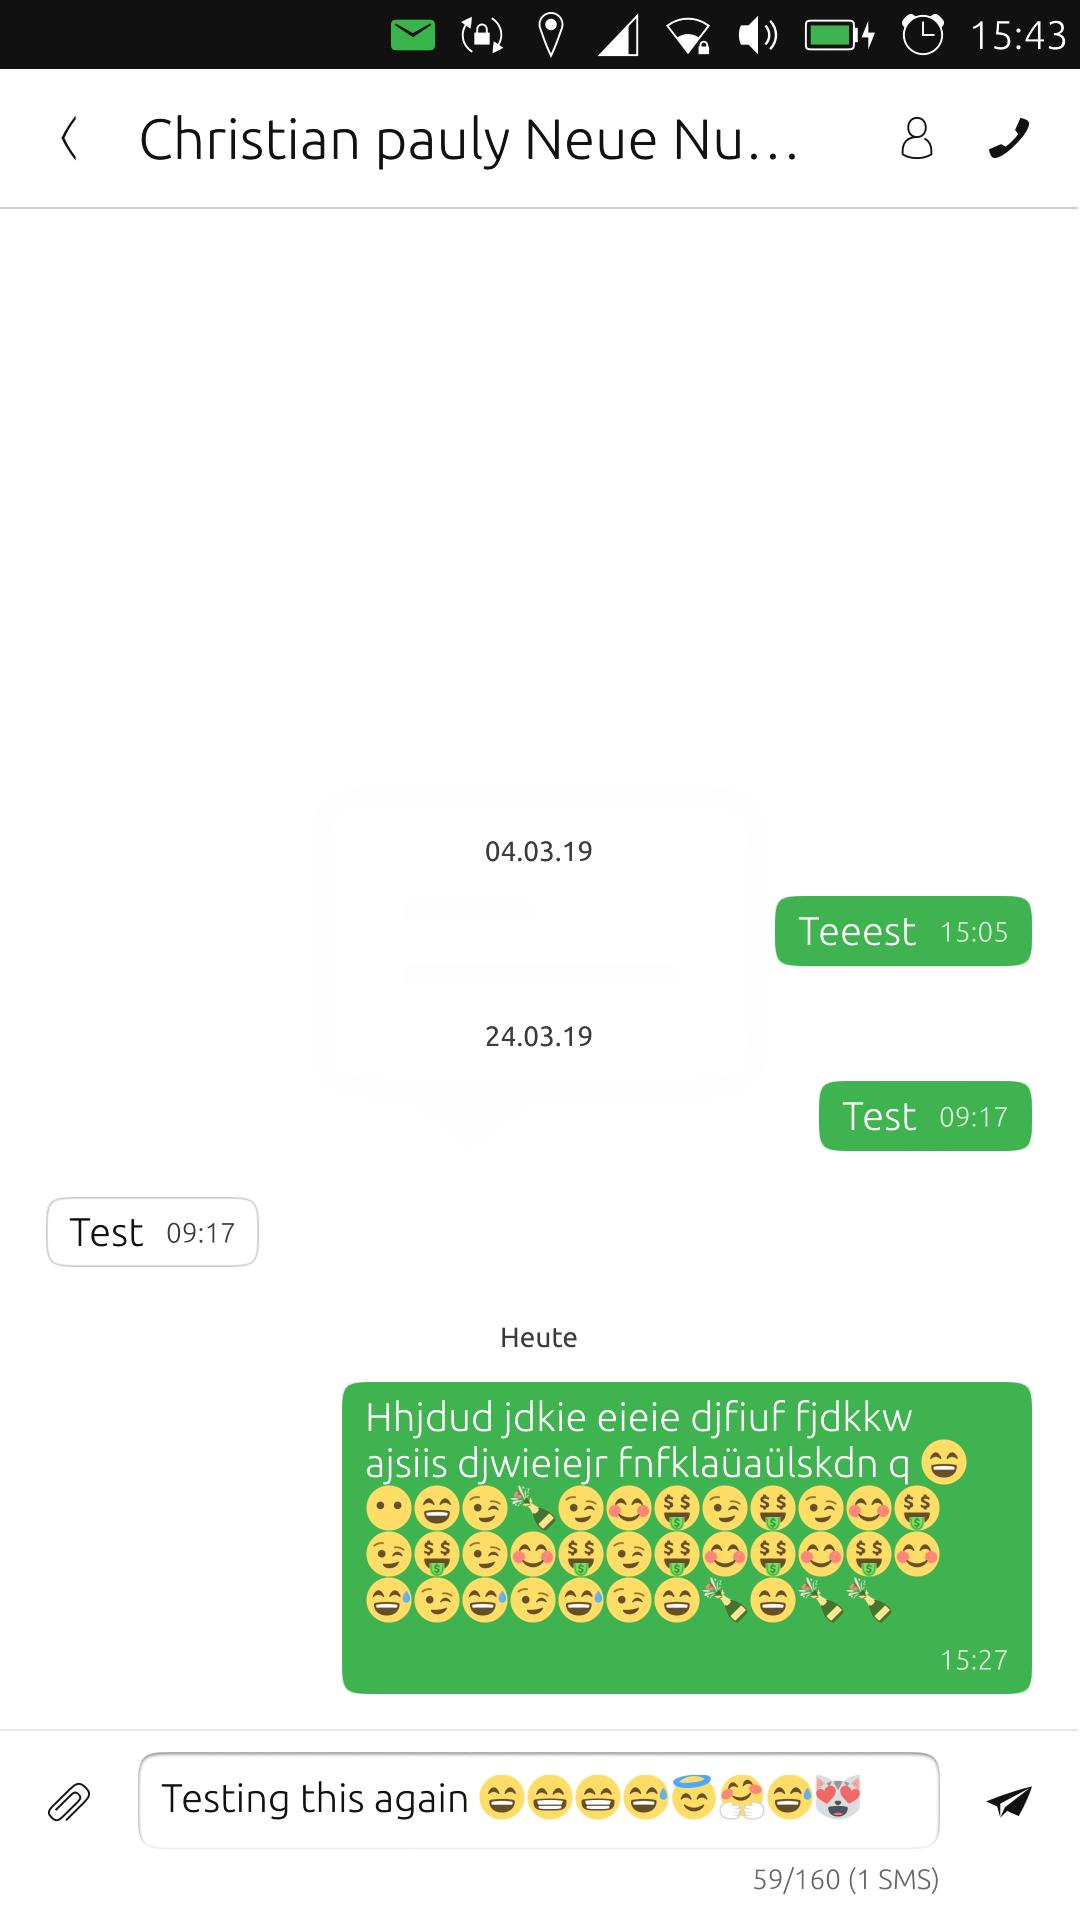 screenshot20190405_154308539